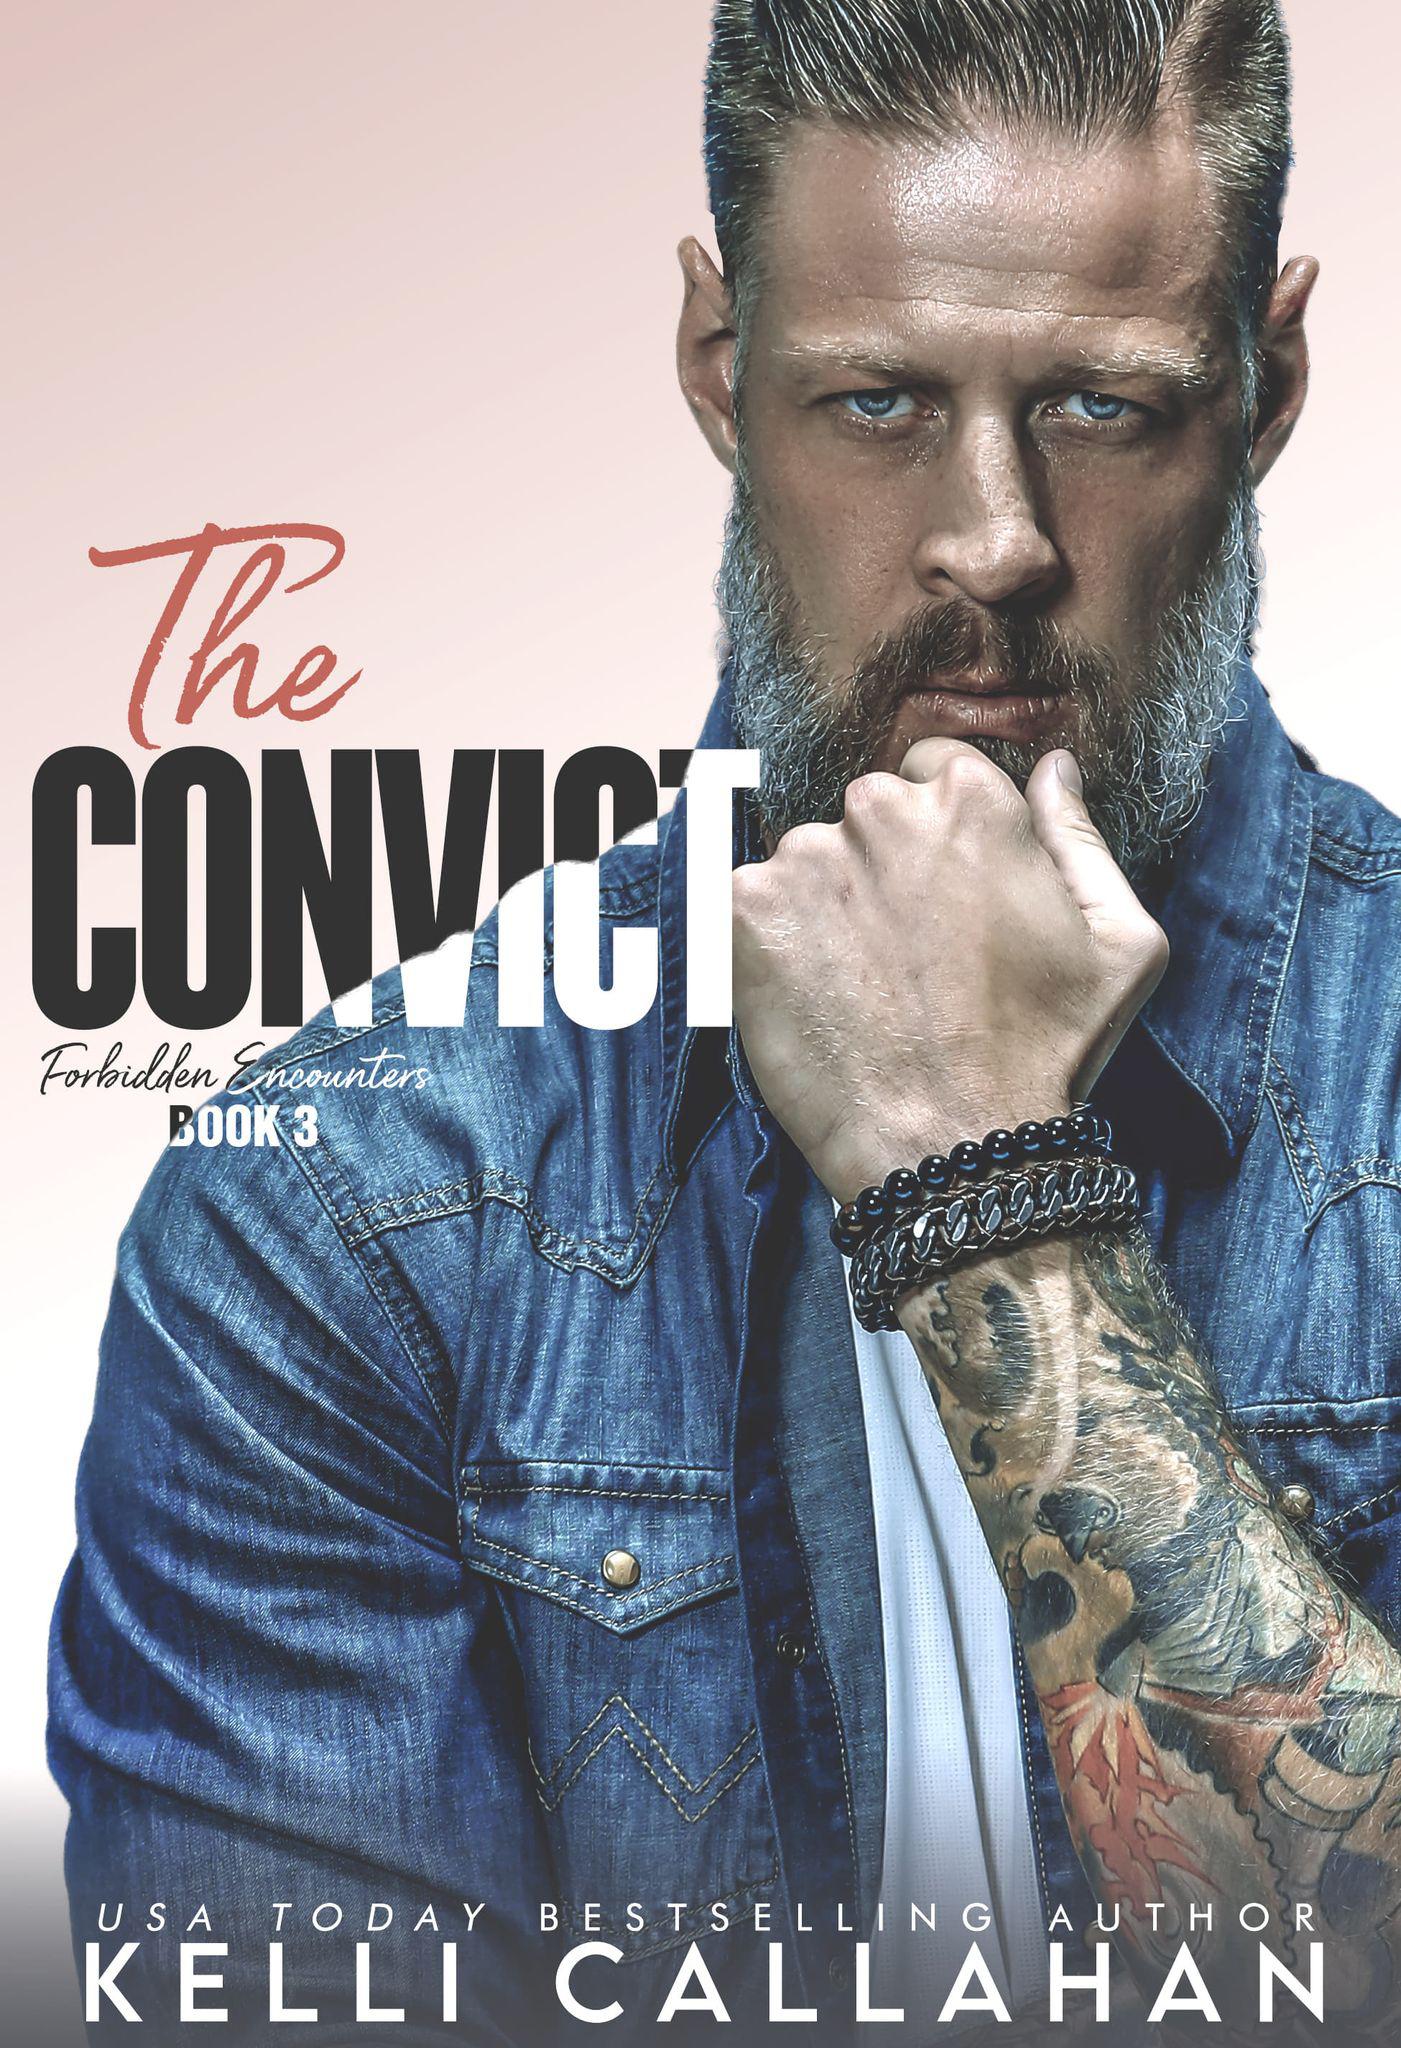 THE CONVICT